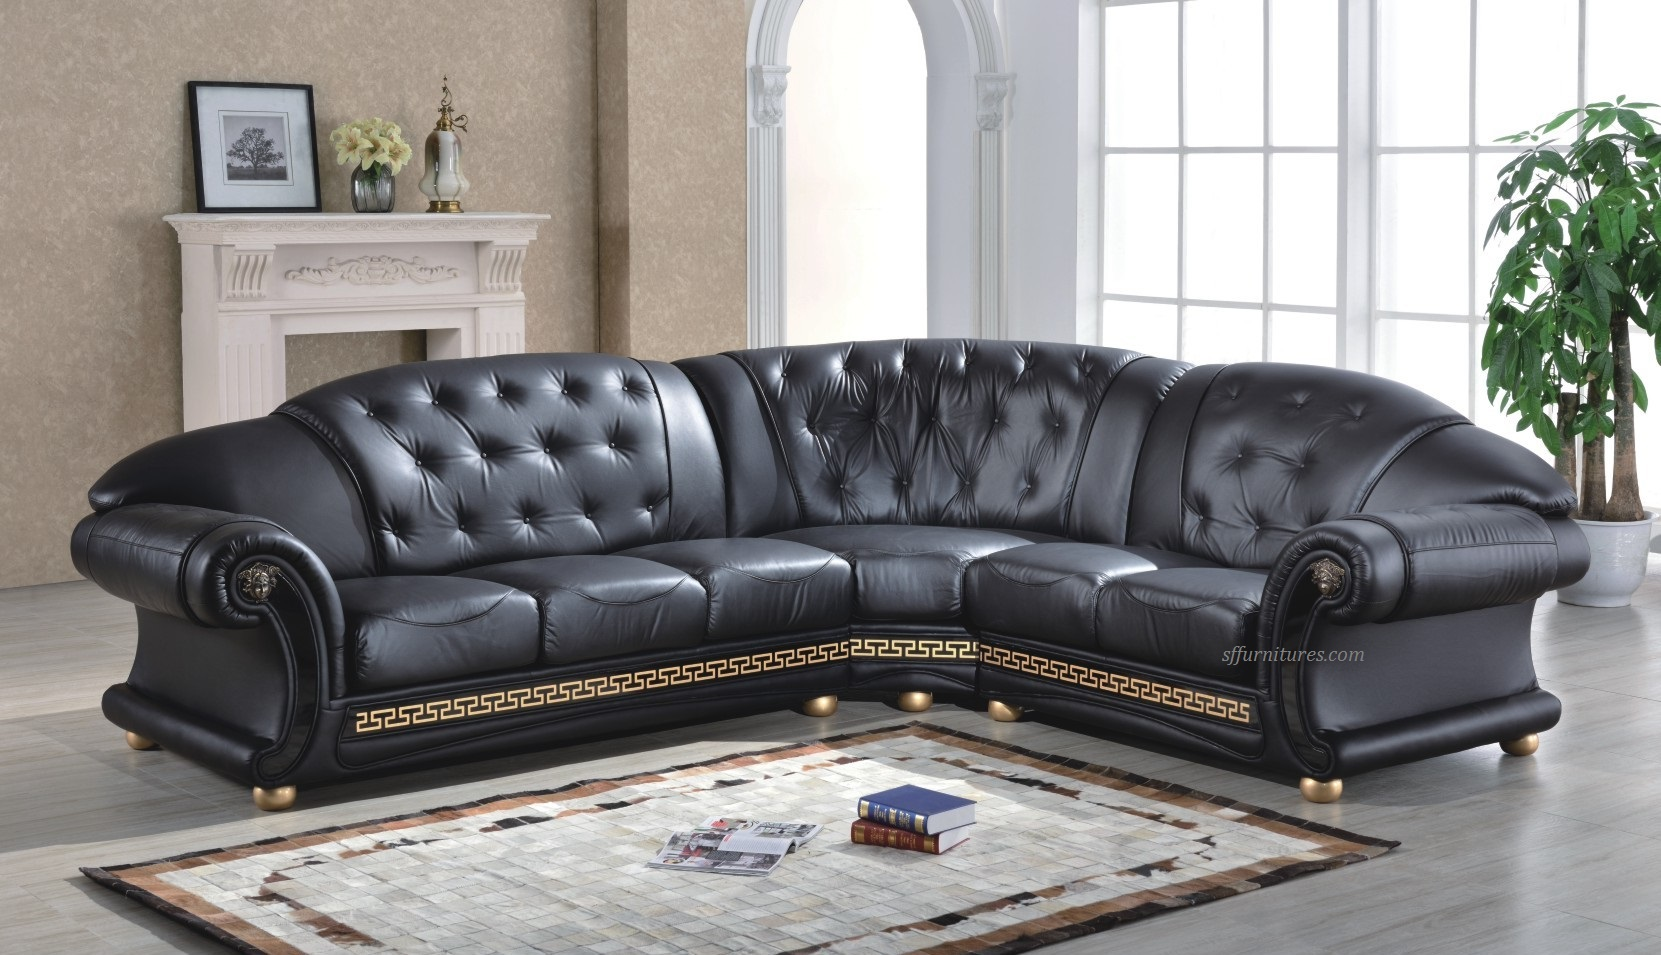 Italian furnitures - Medusa Corner Sofa